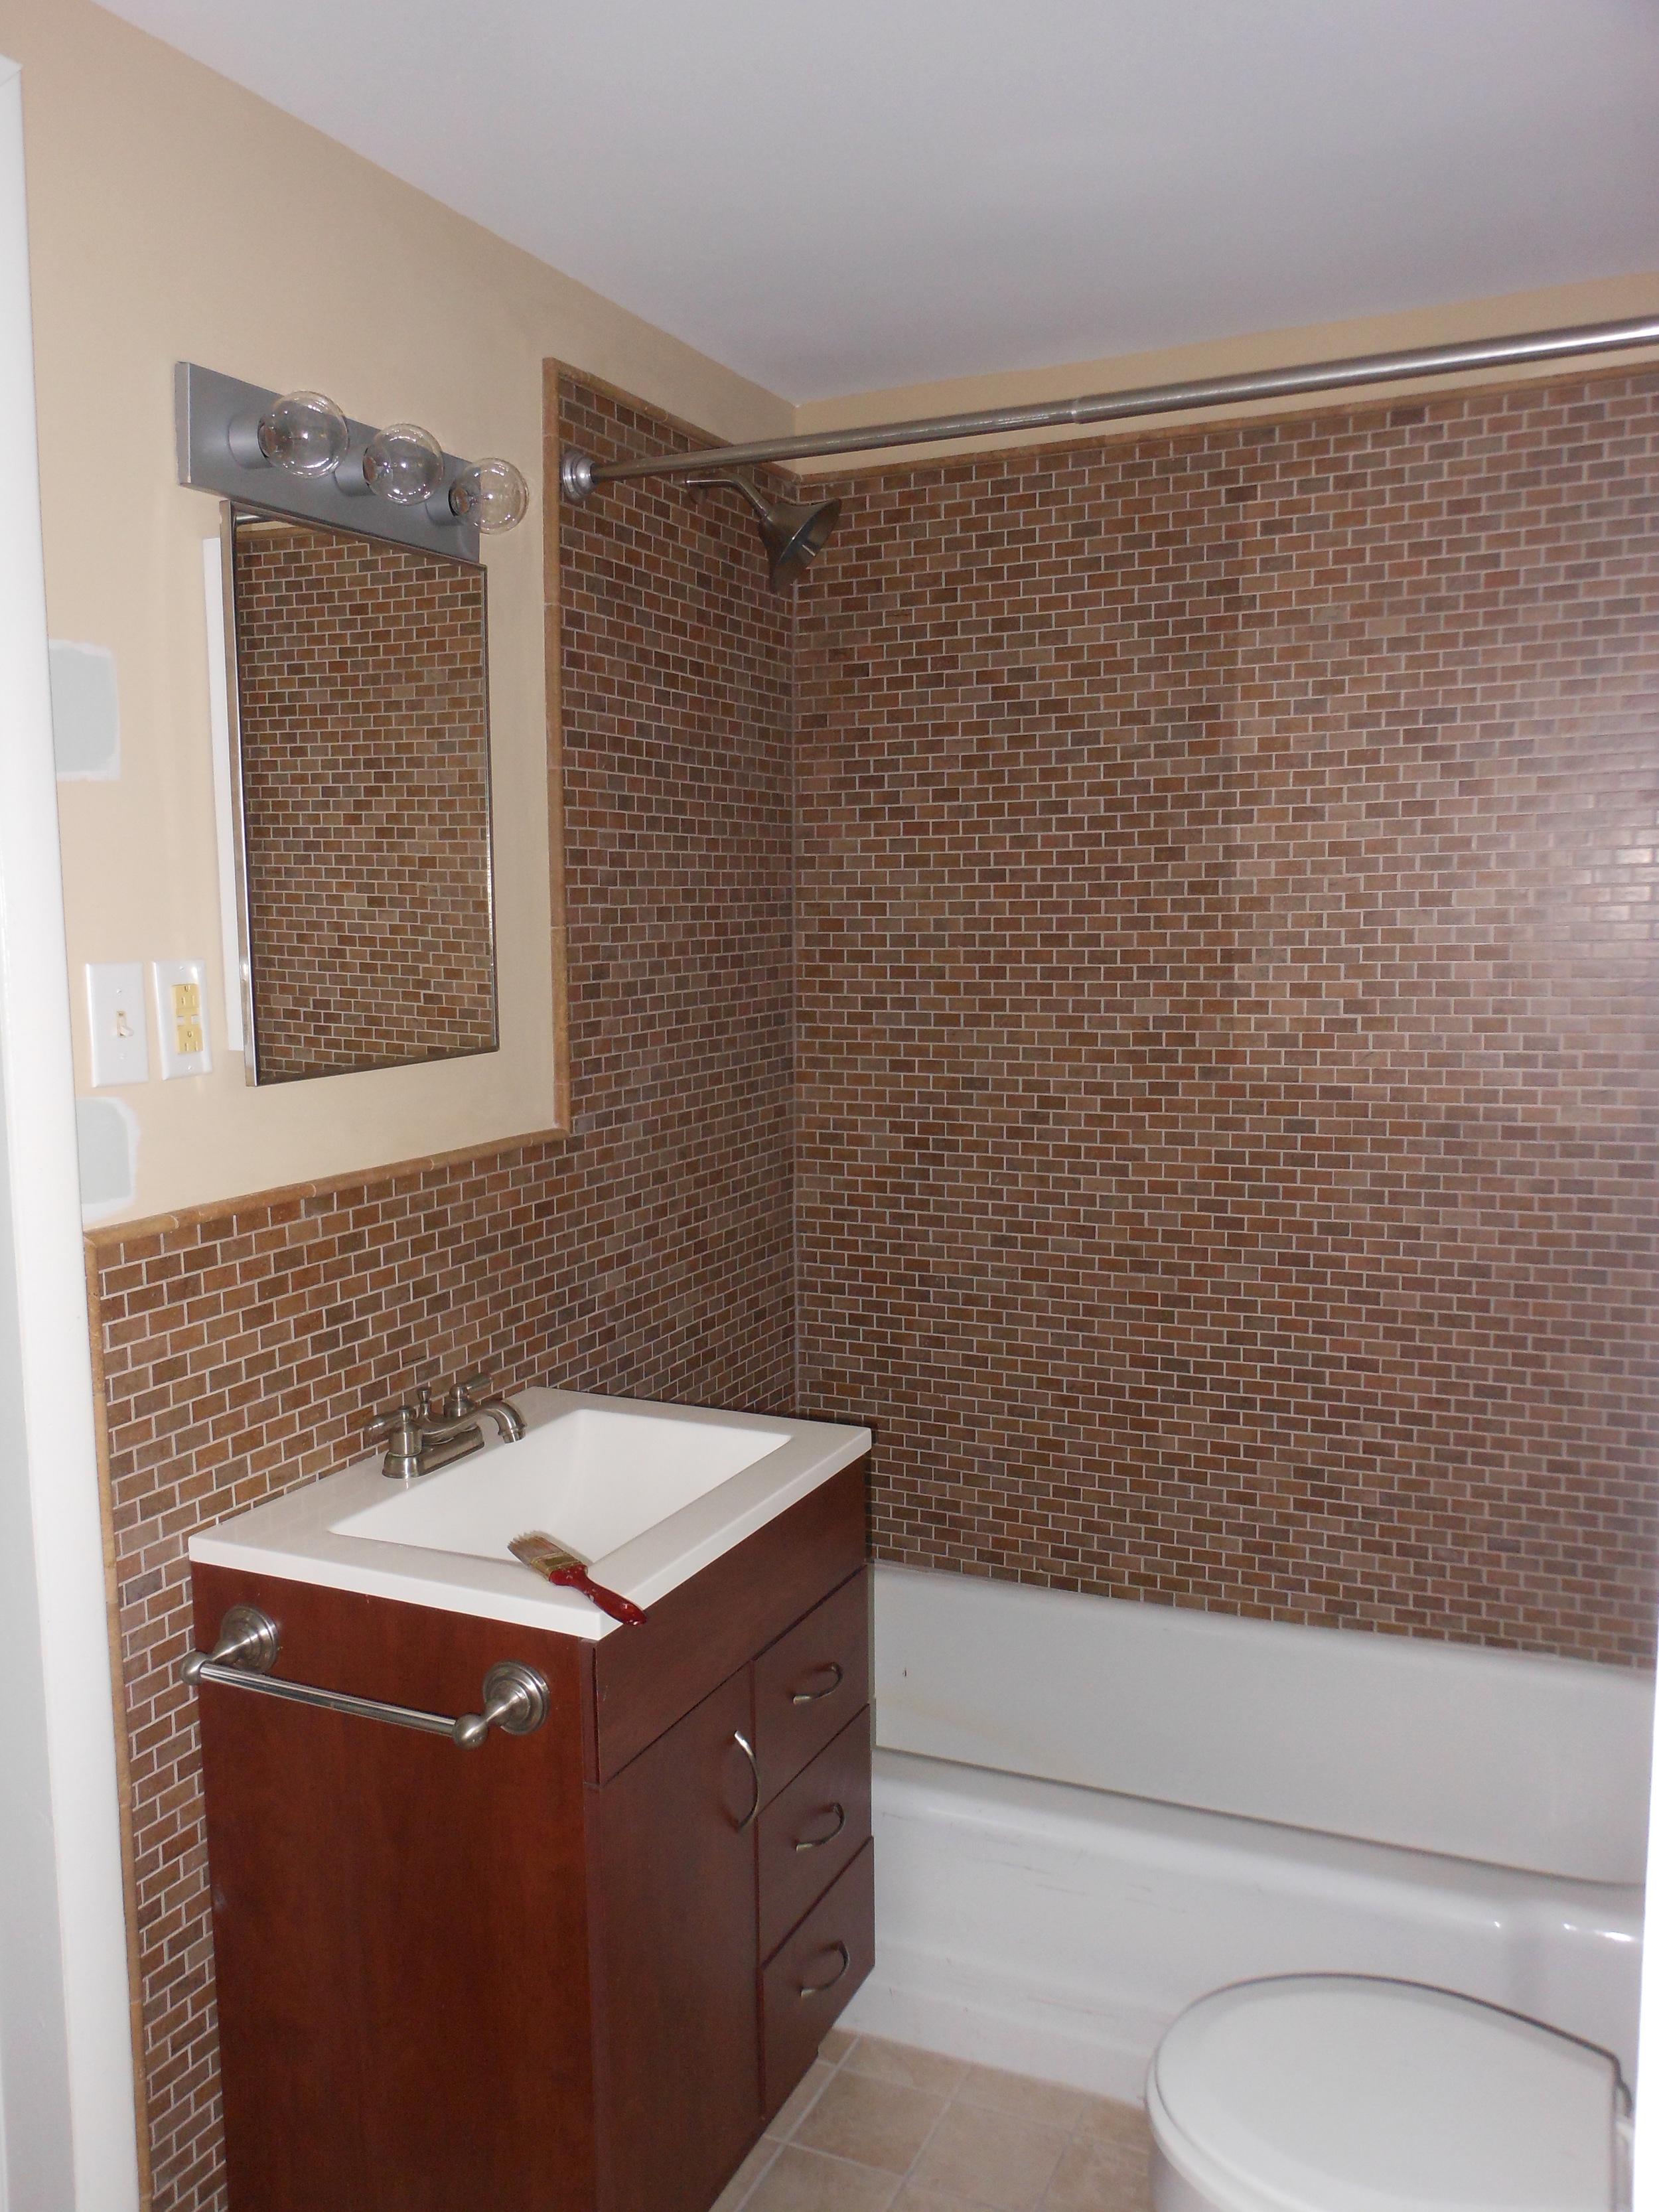 Raleigh Real Estate Before - Bathroom photos